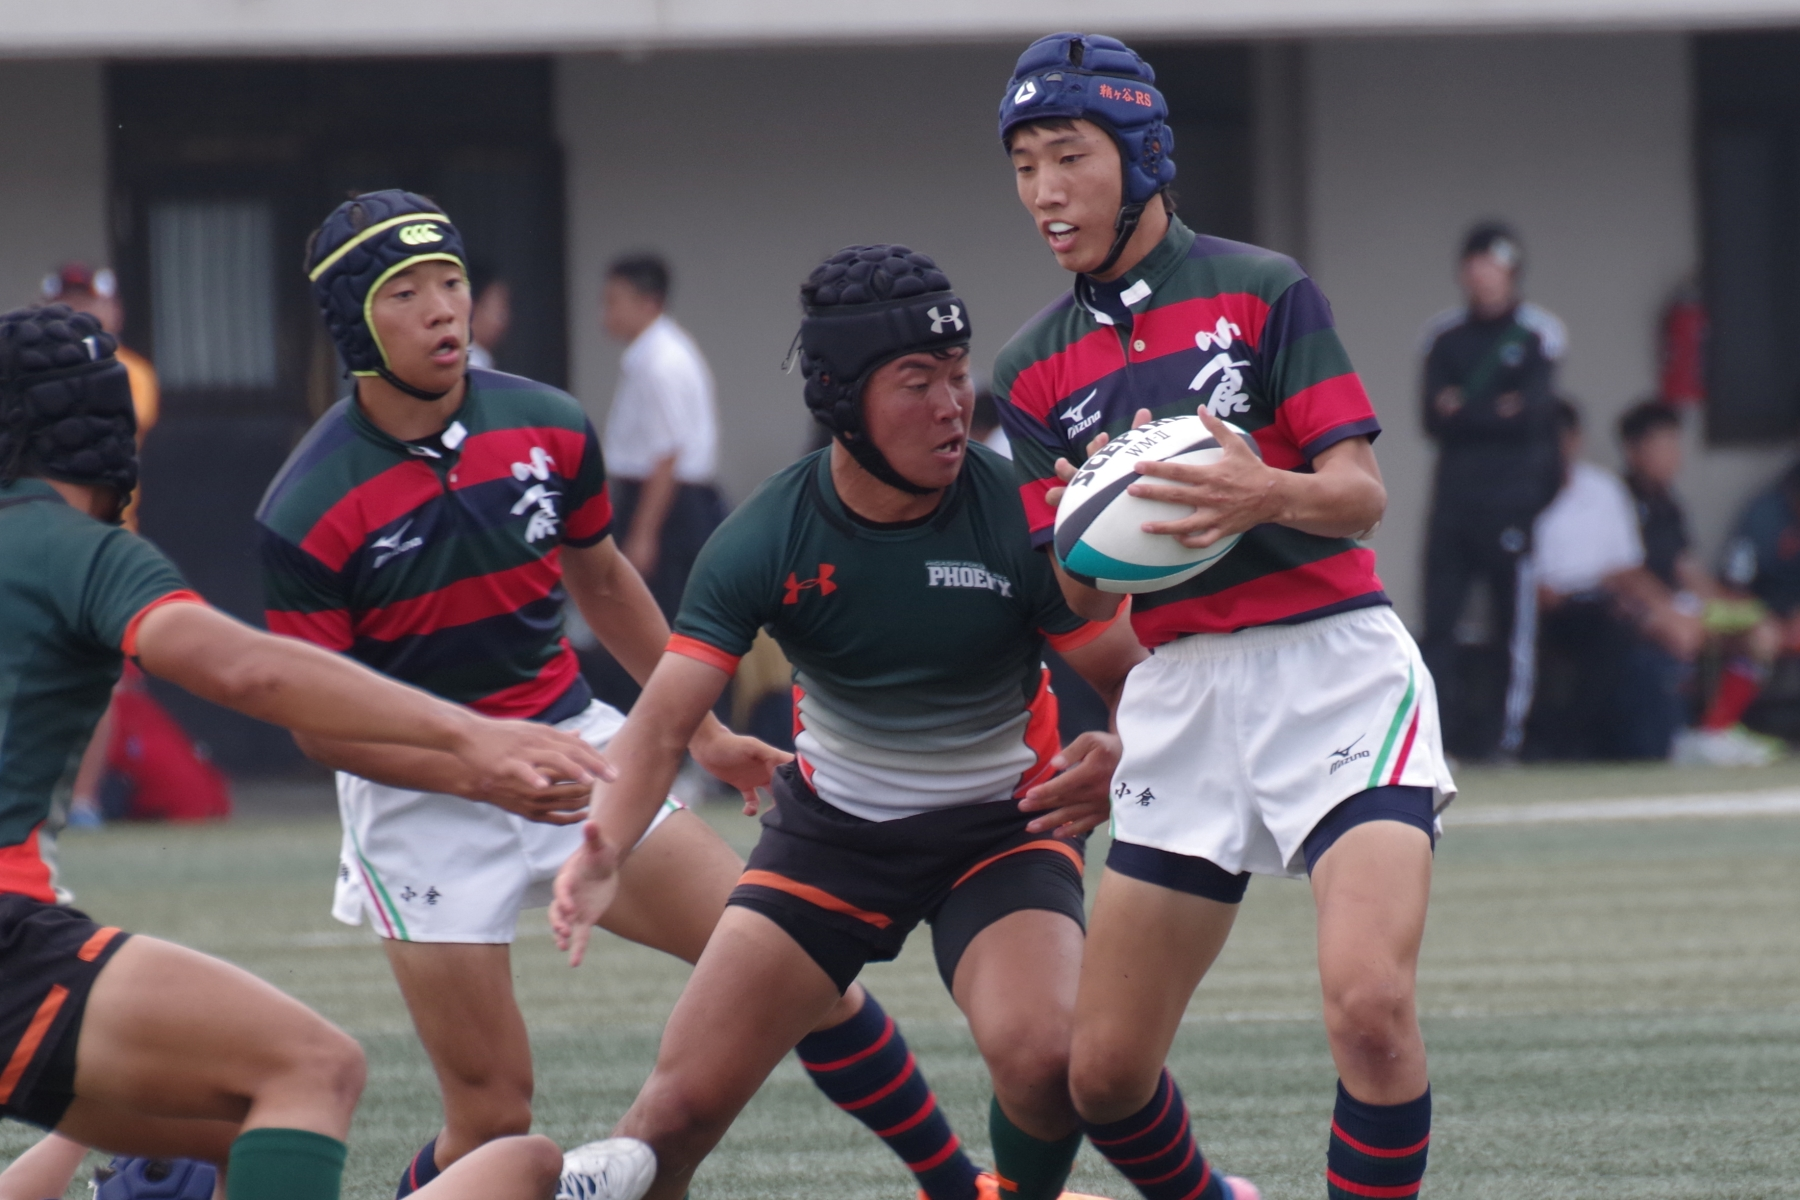 http://kokura-rugby.sakura.ne.jp/180610_112704_0648.jpg